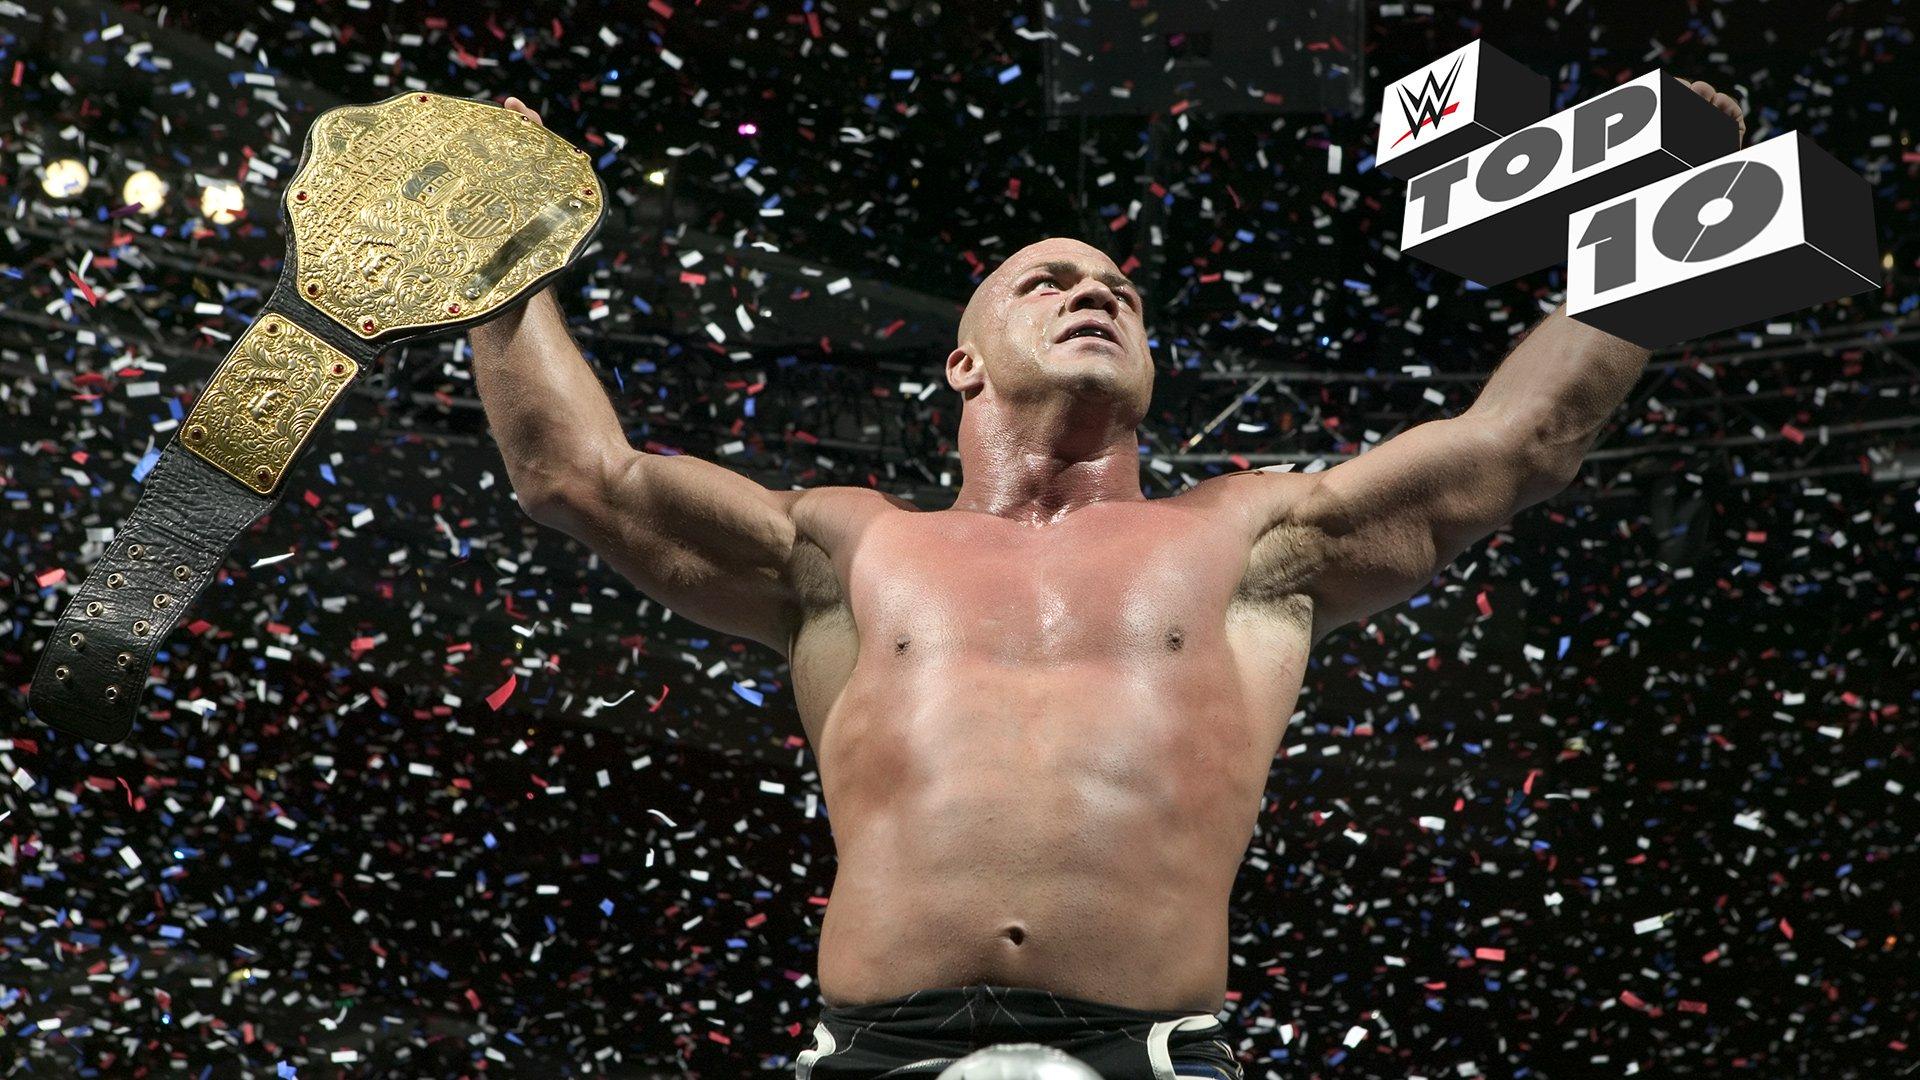 Biggest Battle Royal victories: WWE Top 10, Dec. 3, 2018